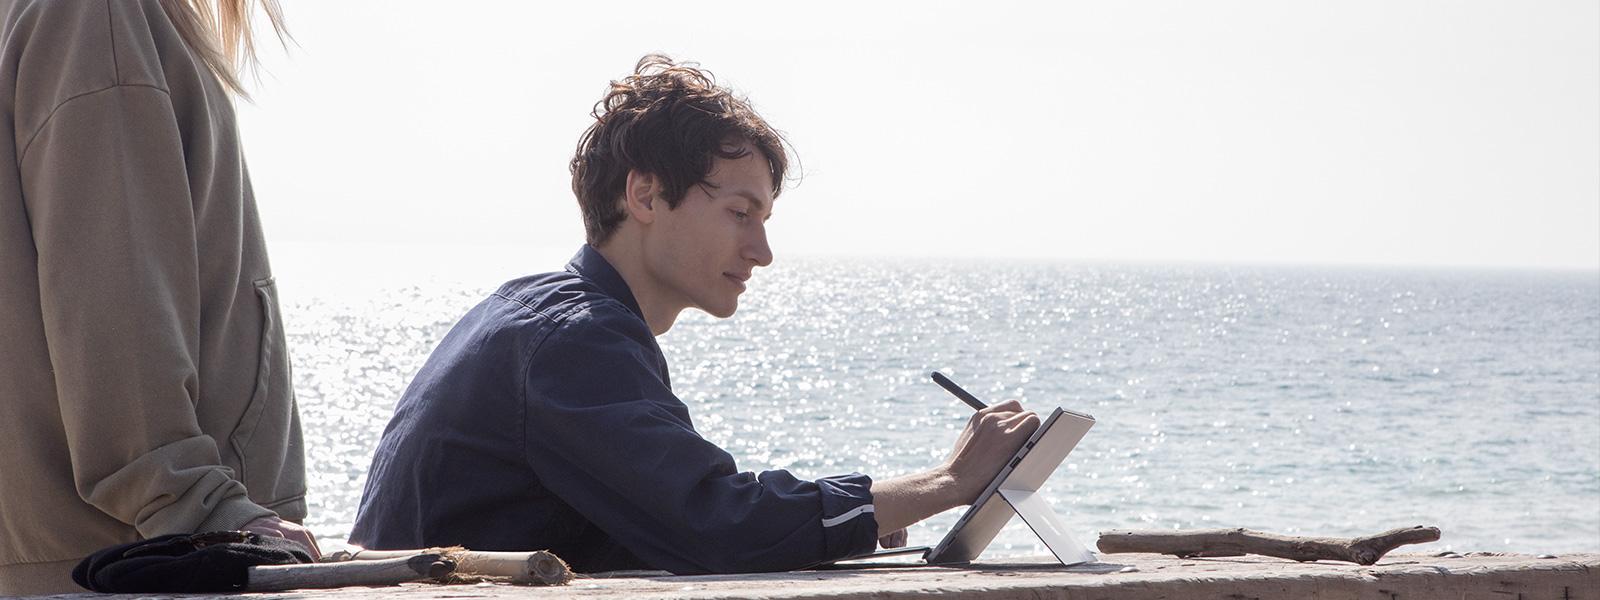 رجل يستخدم Surface Pro في موقع خارجي